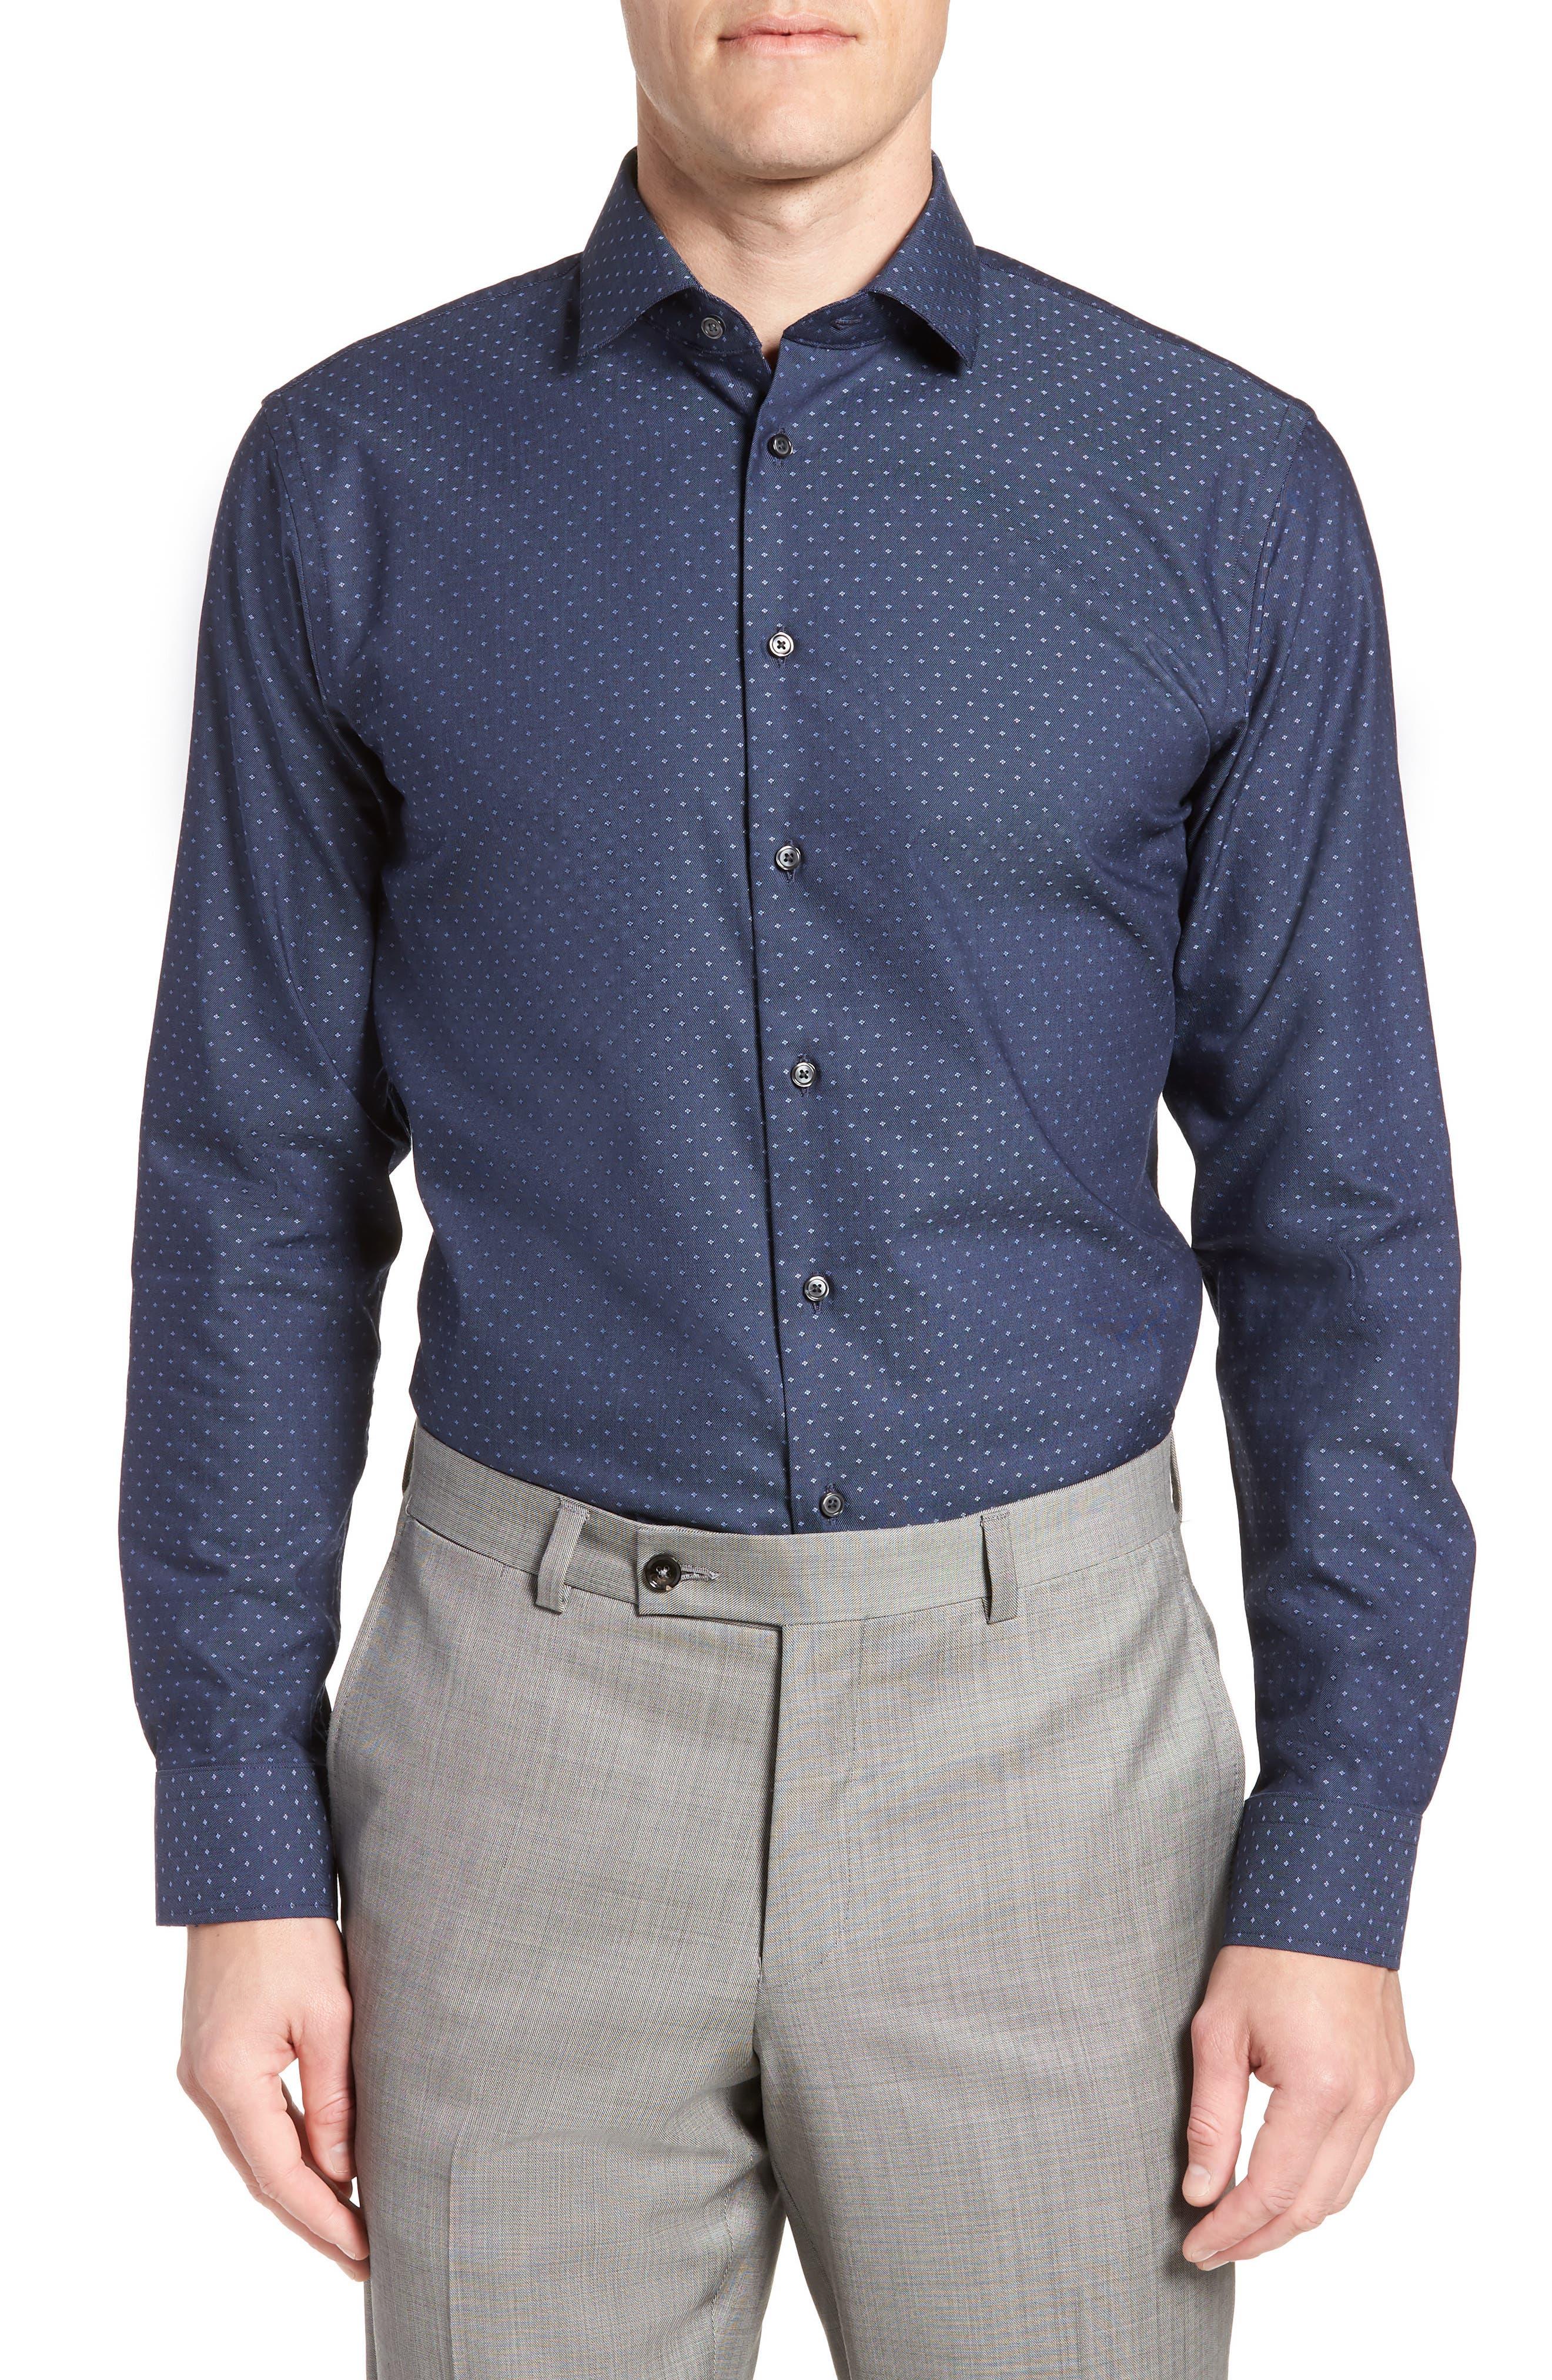 Calibrate Trim Fit Jacquard Dress Shirt